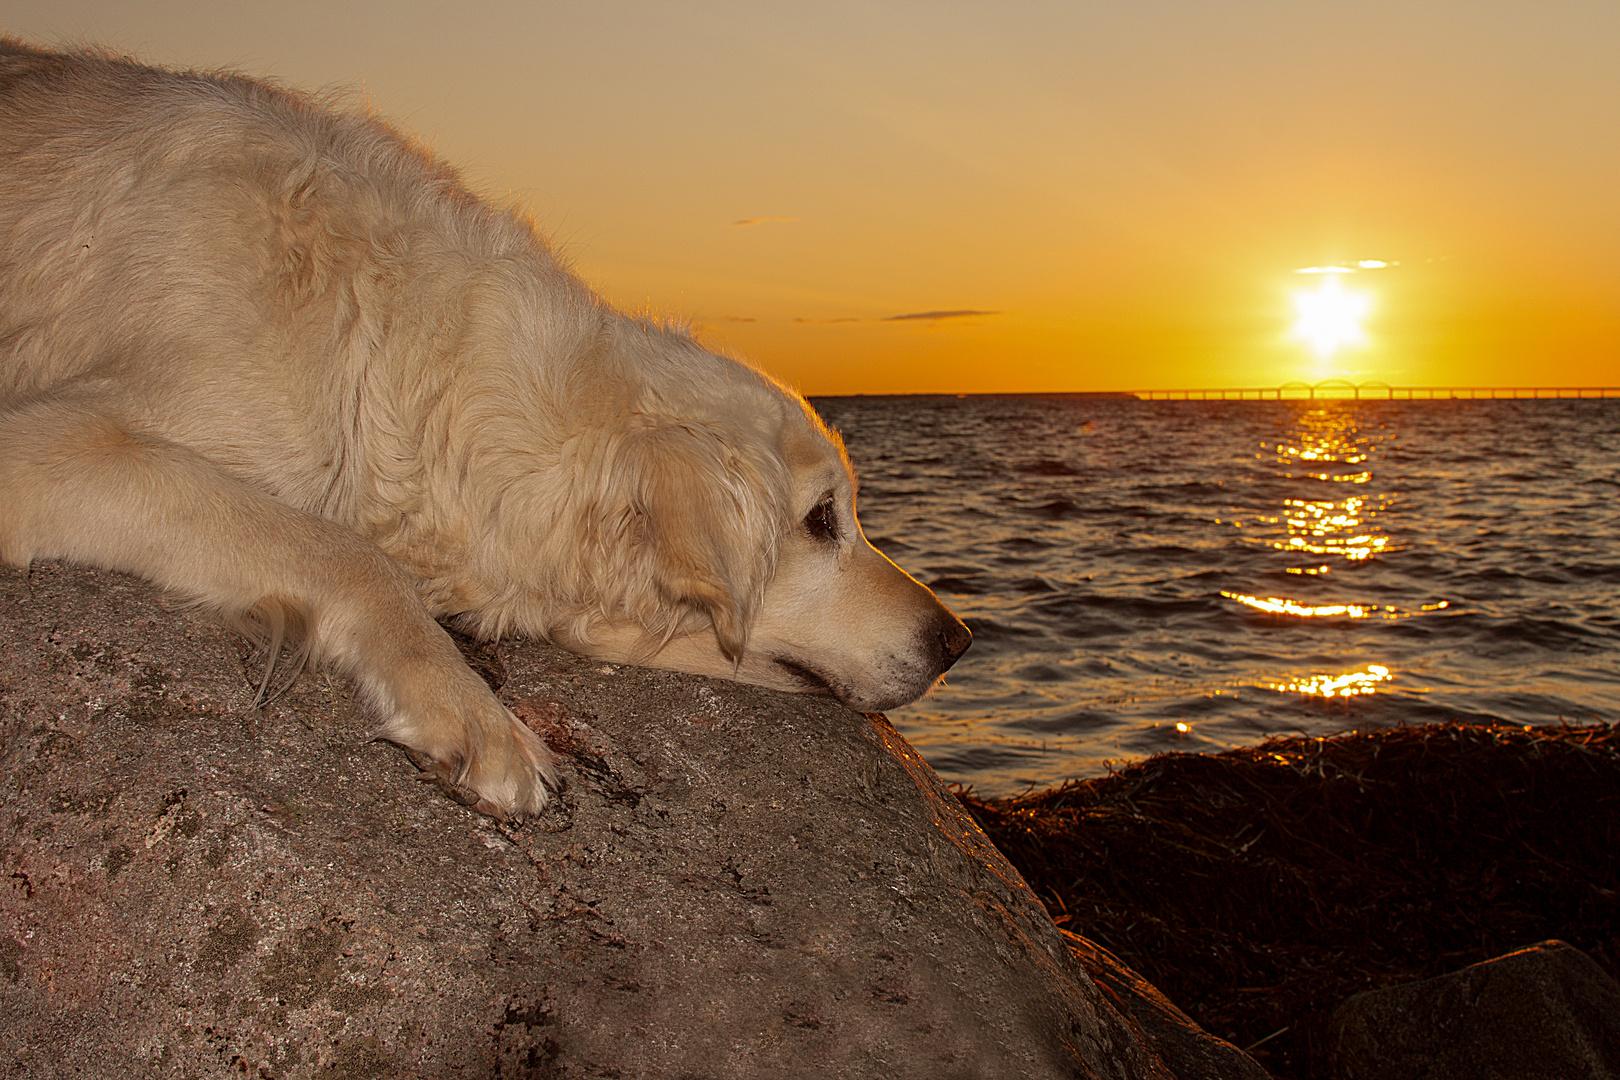 Golden Retriever - Seelenhund